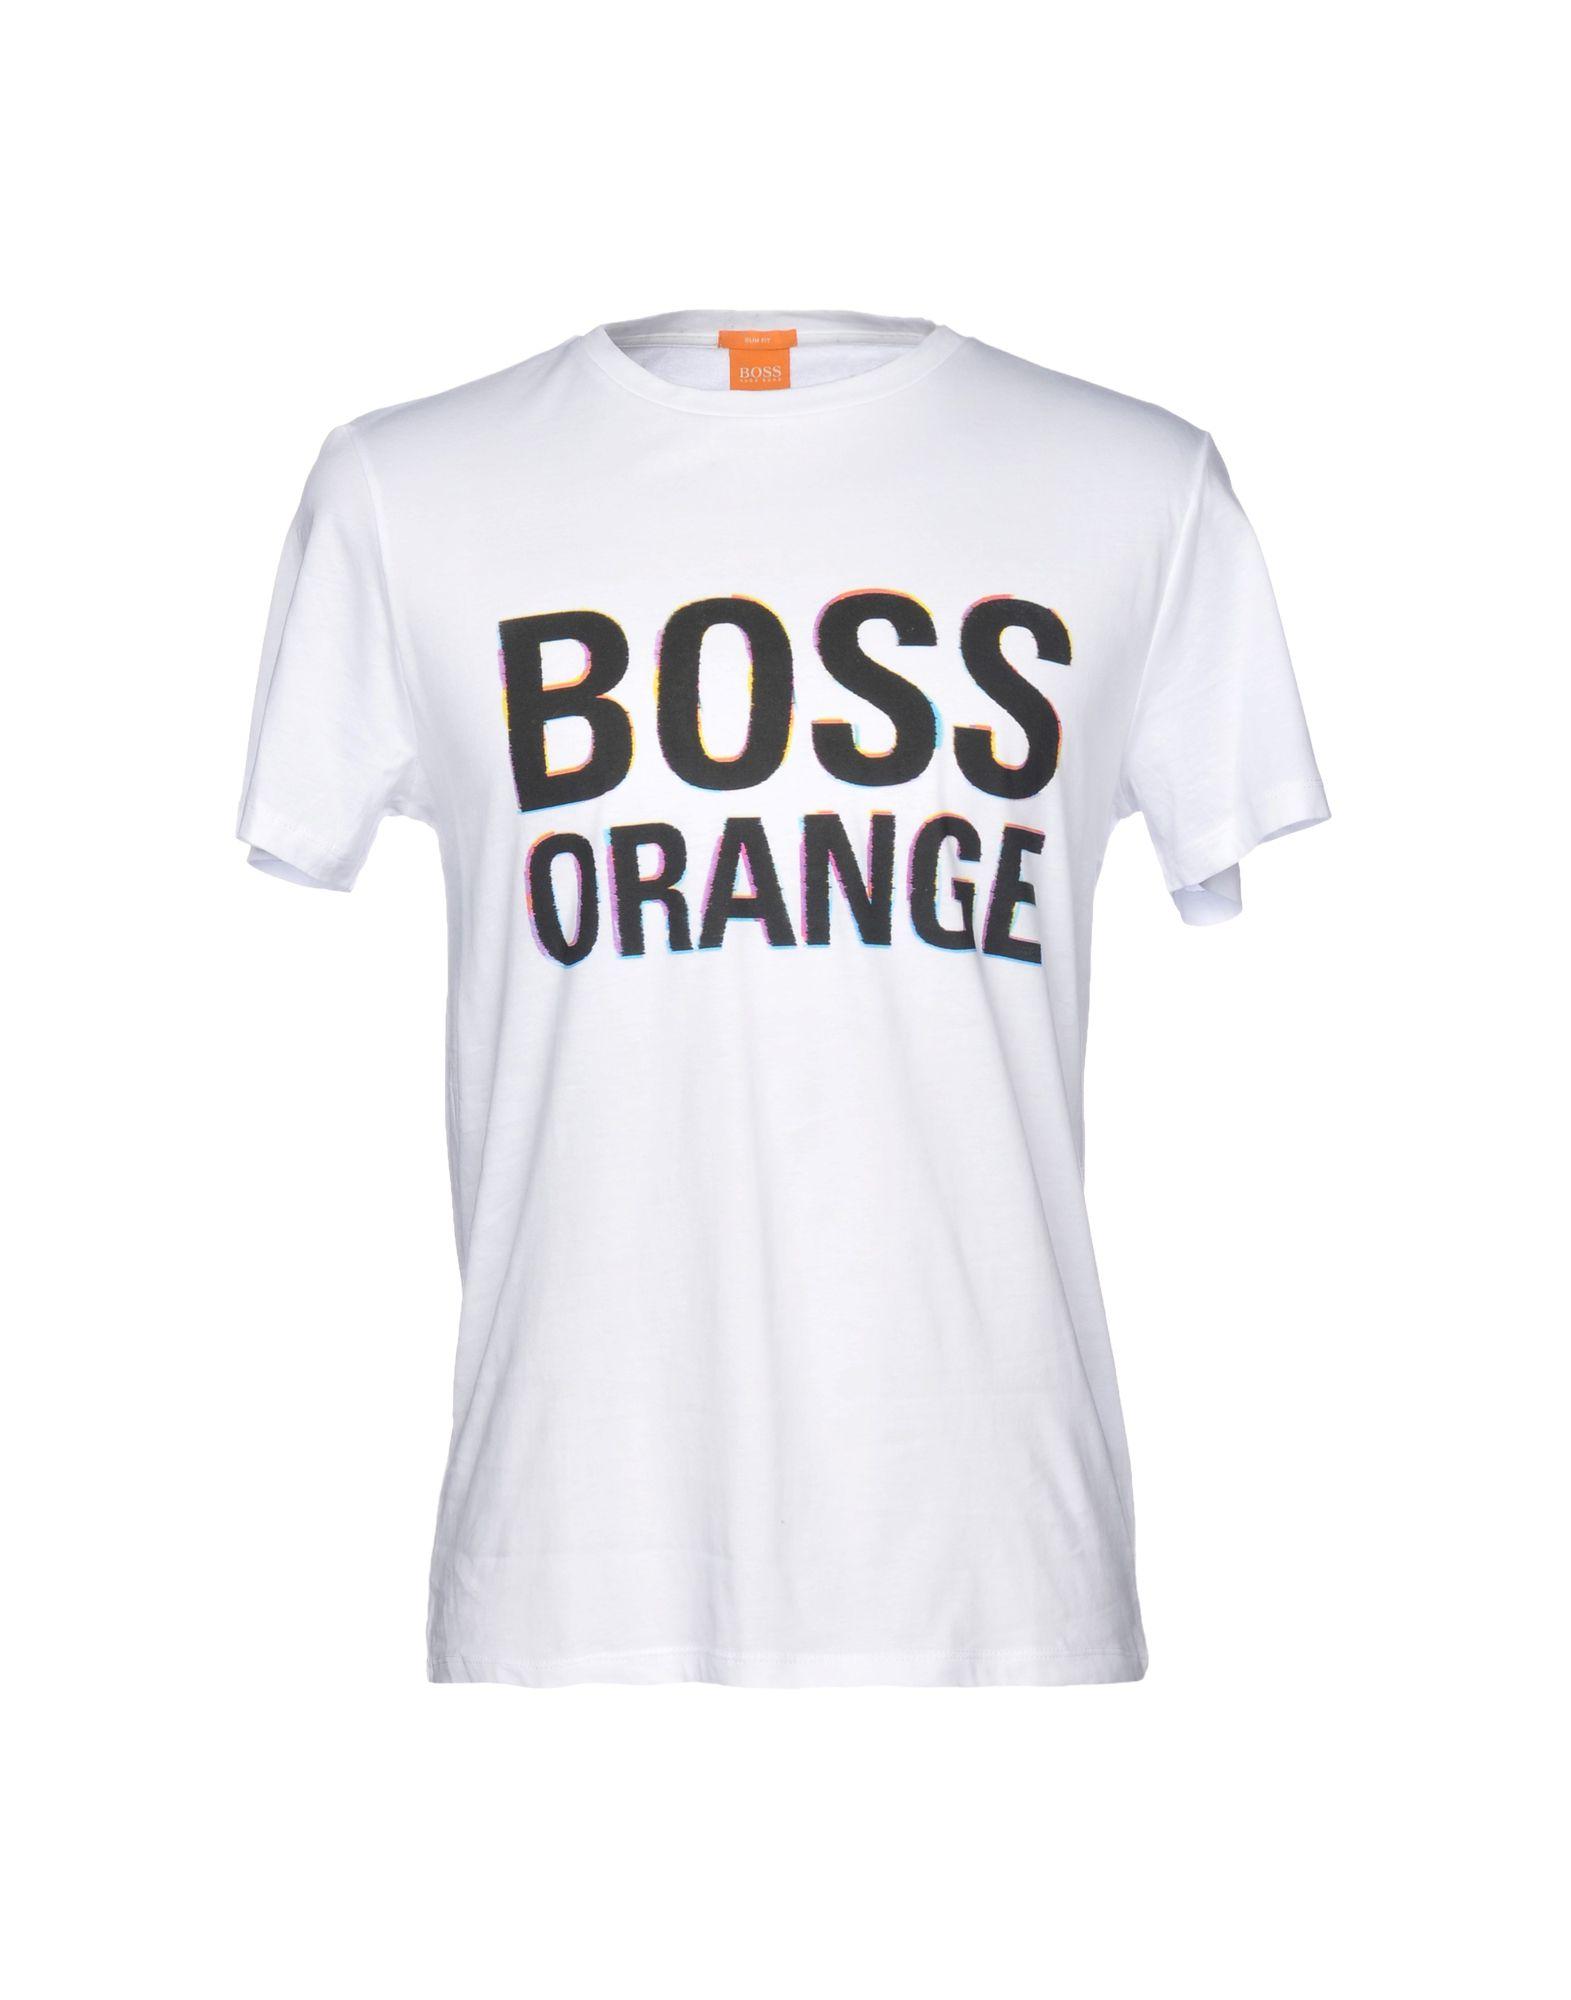 BOSS ORANGE Футболка футболка boss orange цвет бежевый